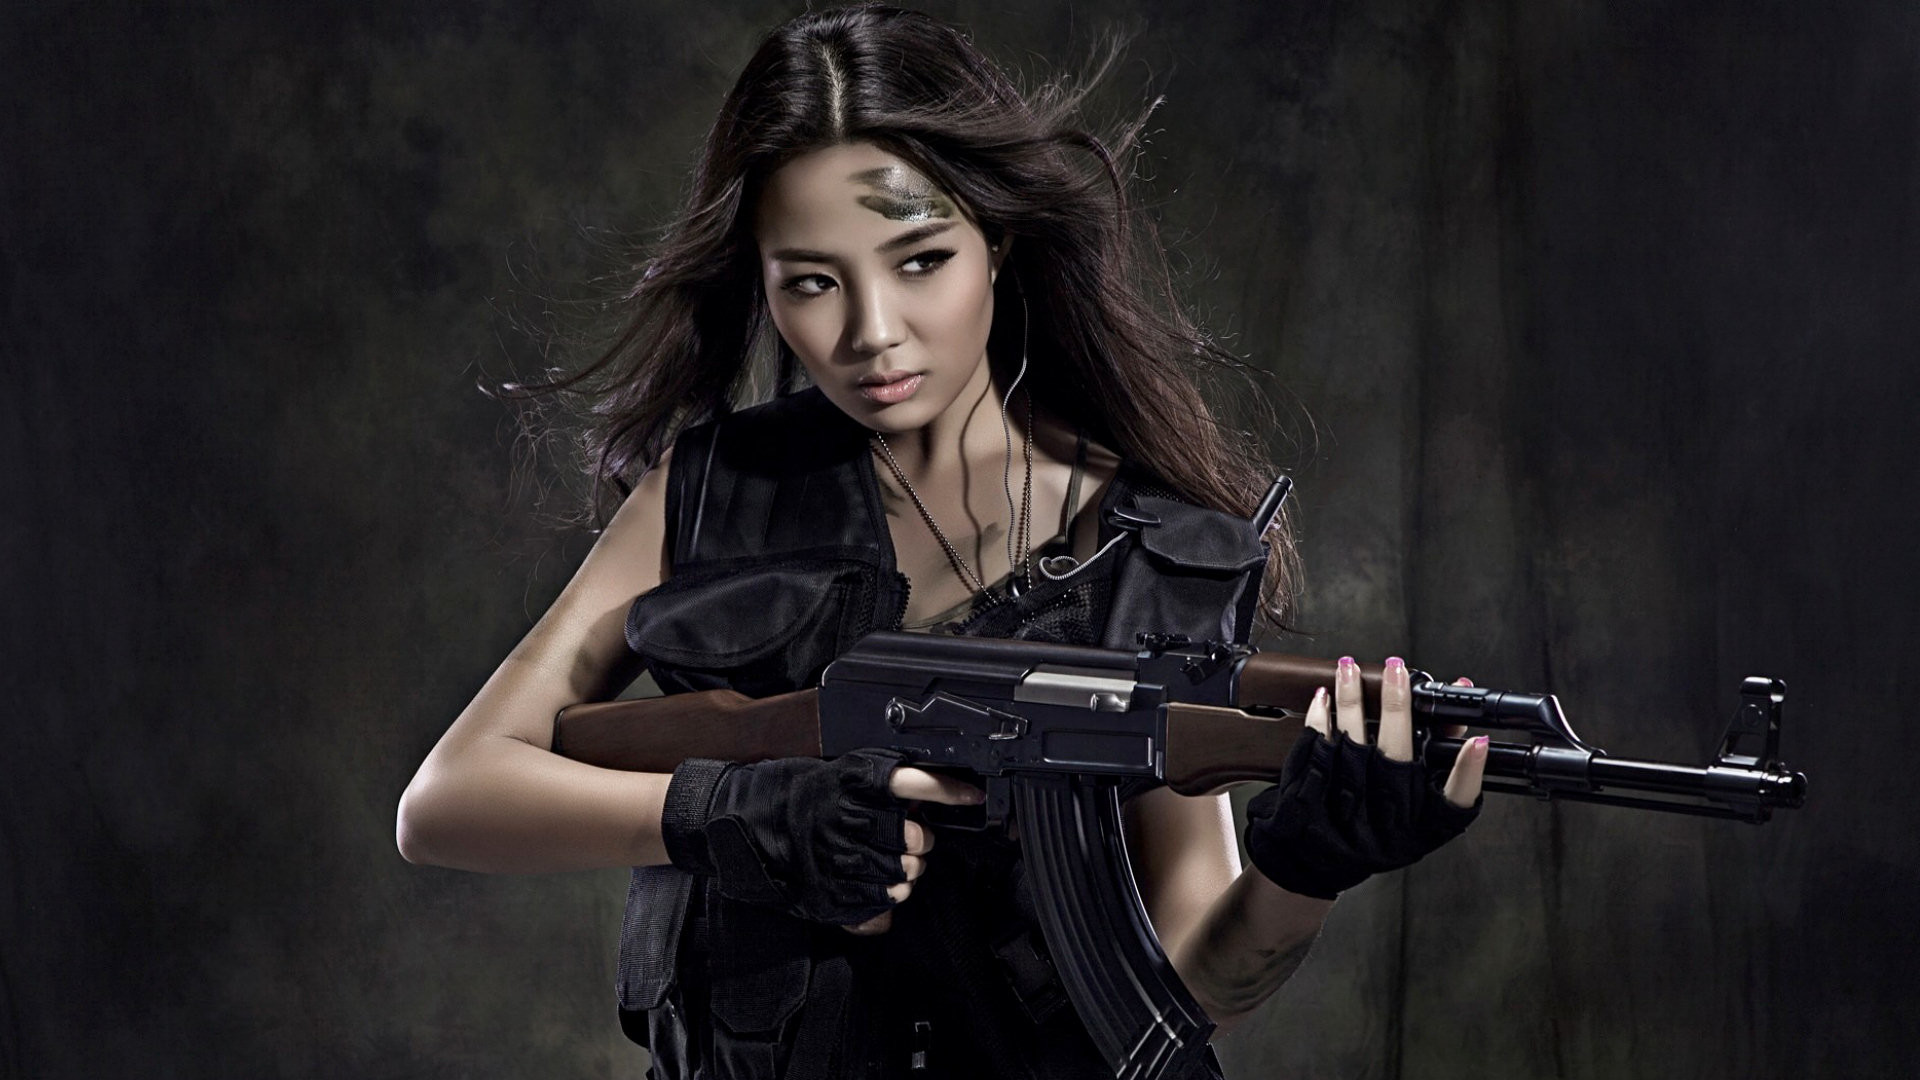 Girl With Gun Wallpaper 55 Images